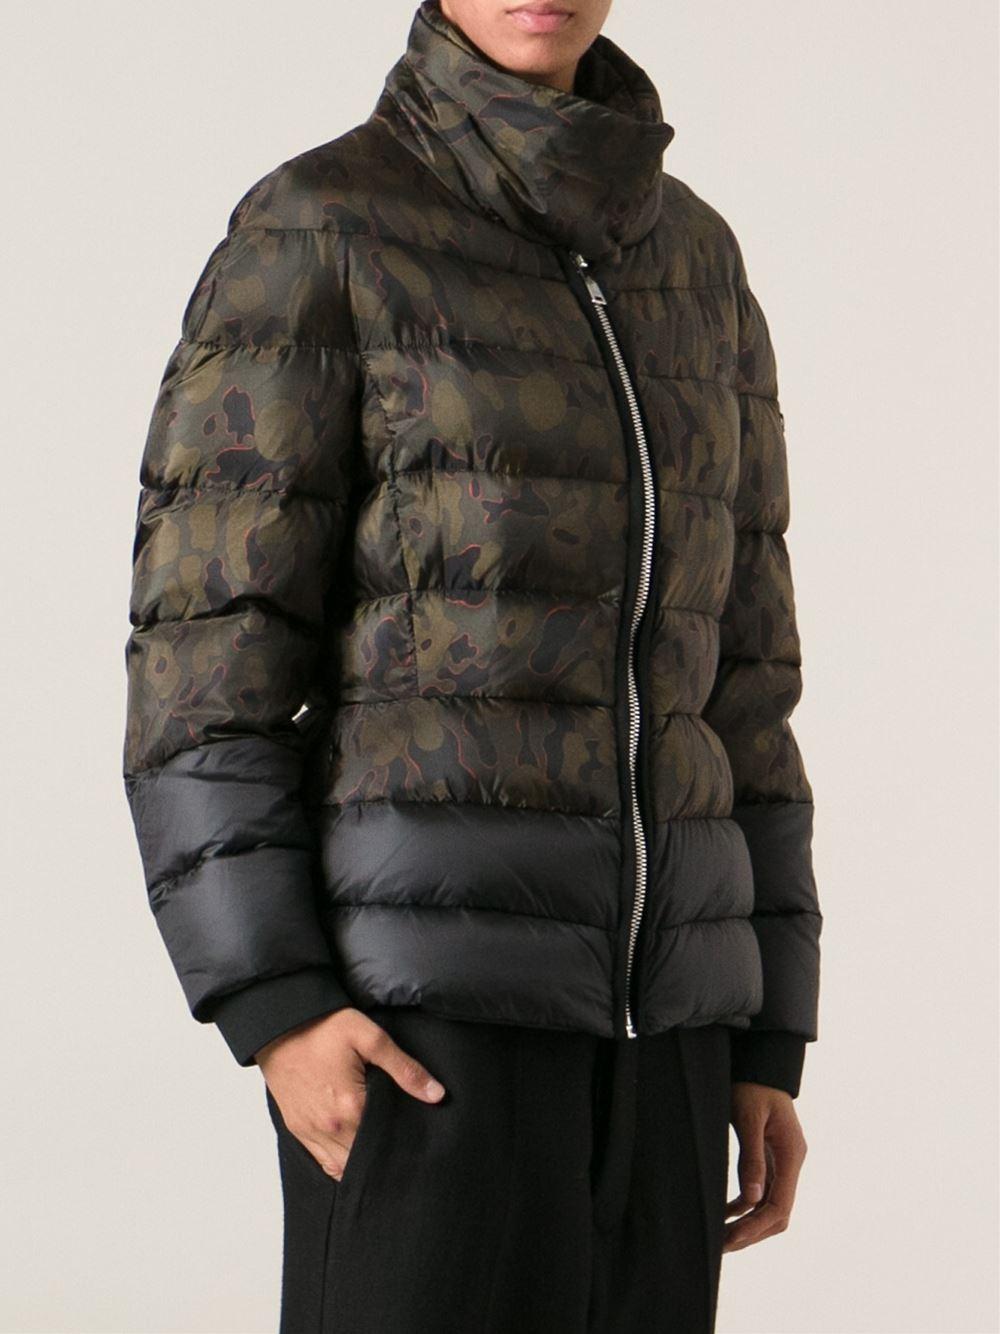 65579b23a Moncler Gamme Bleu Green Camouflage Padded Jacket for men